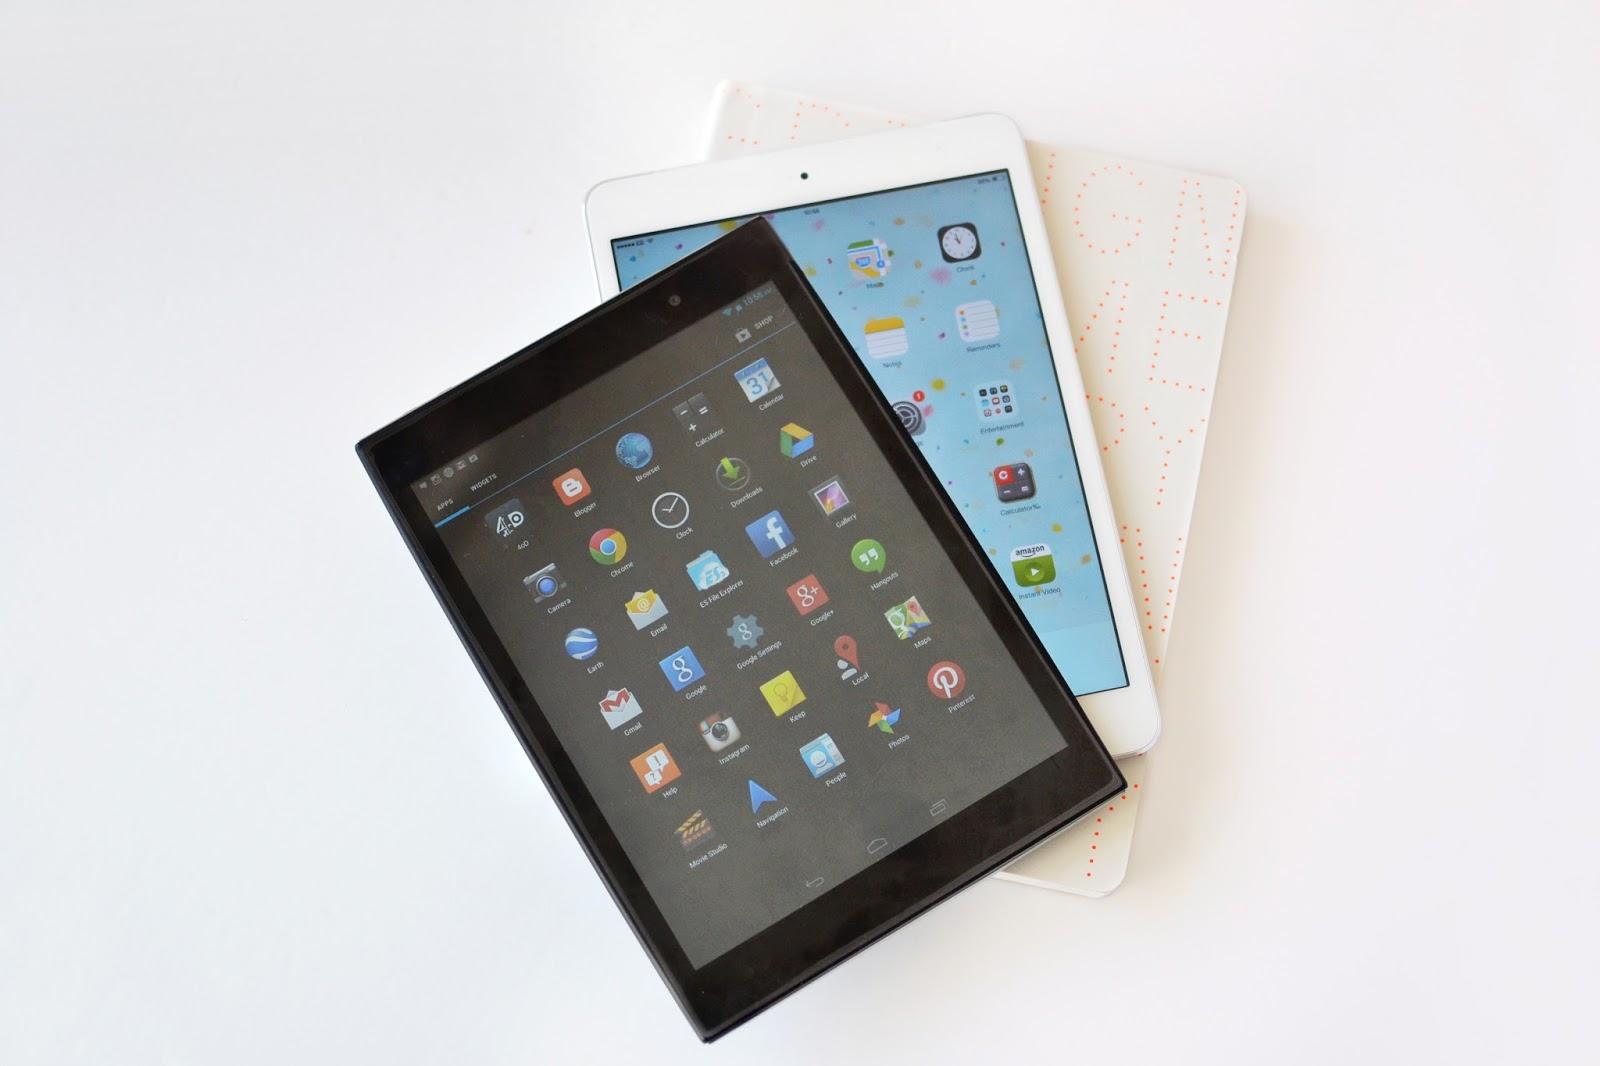 gigaset qv830 tablet review